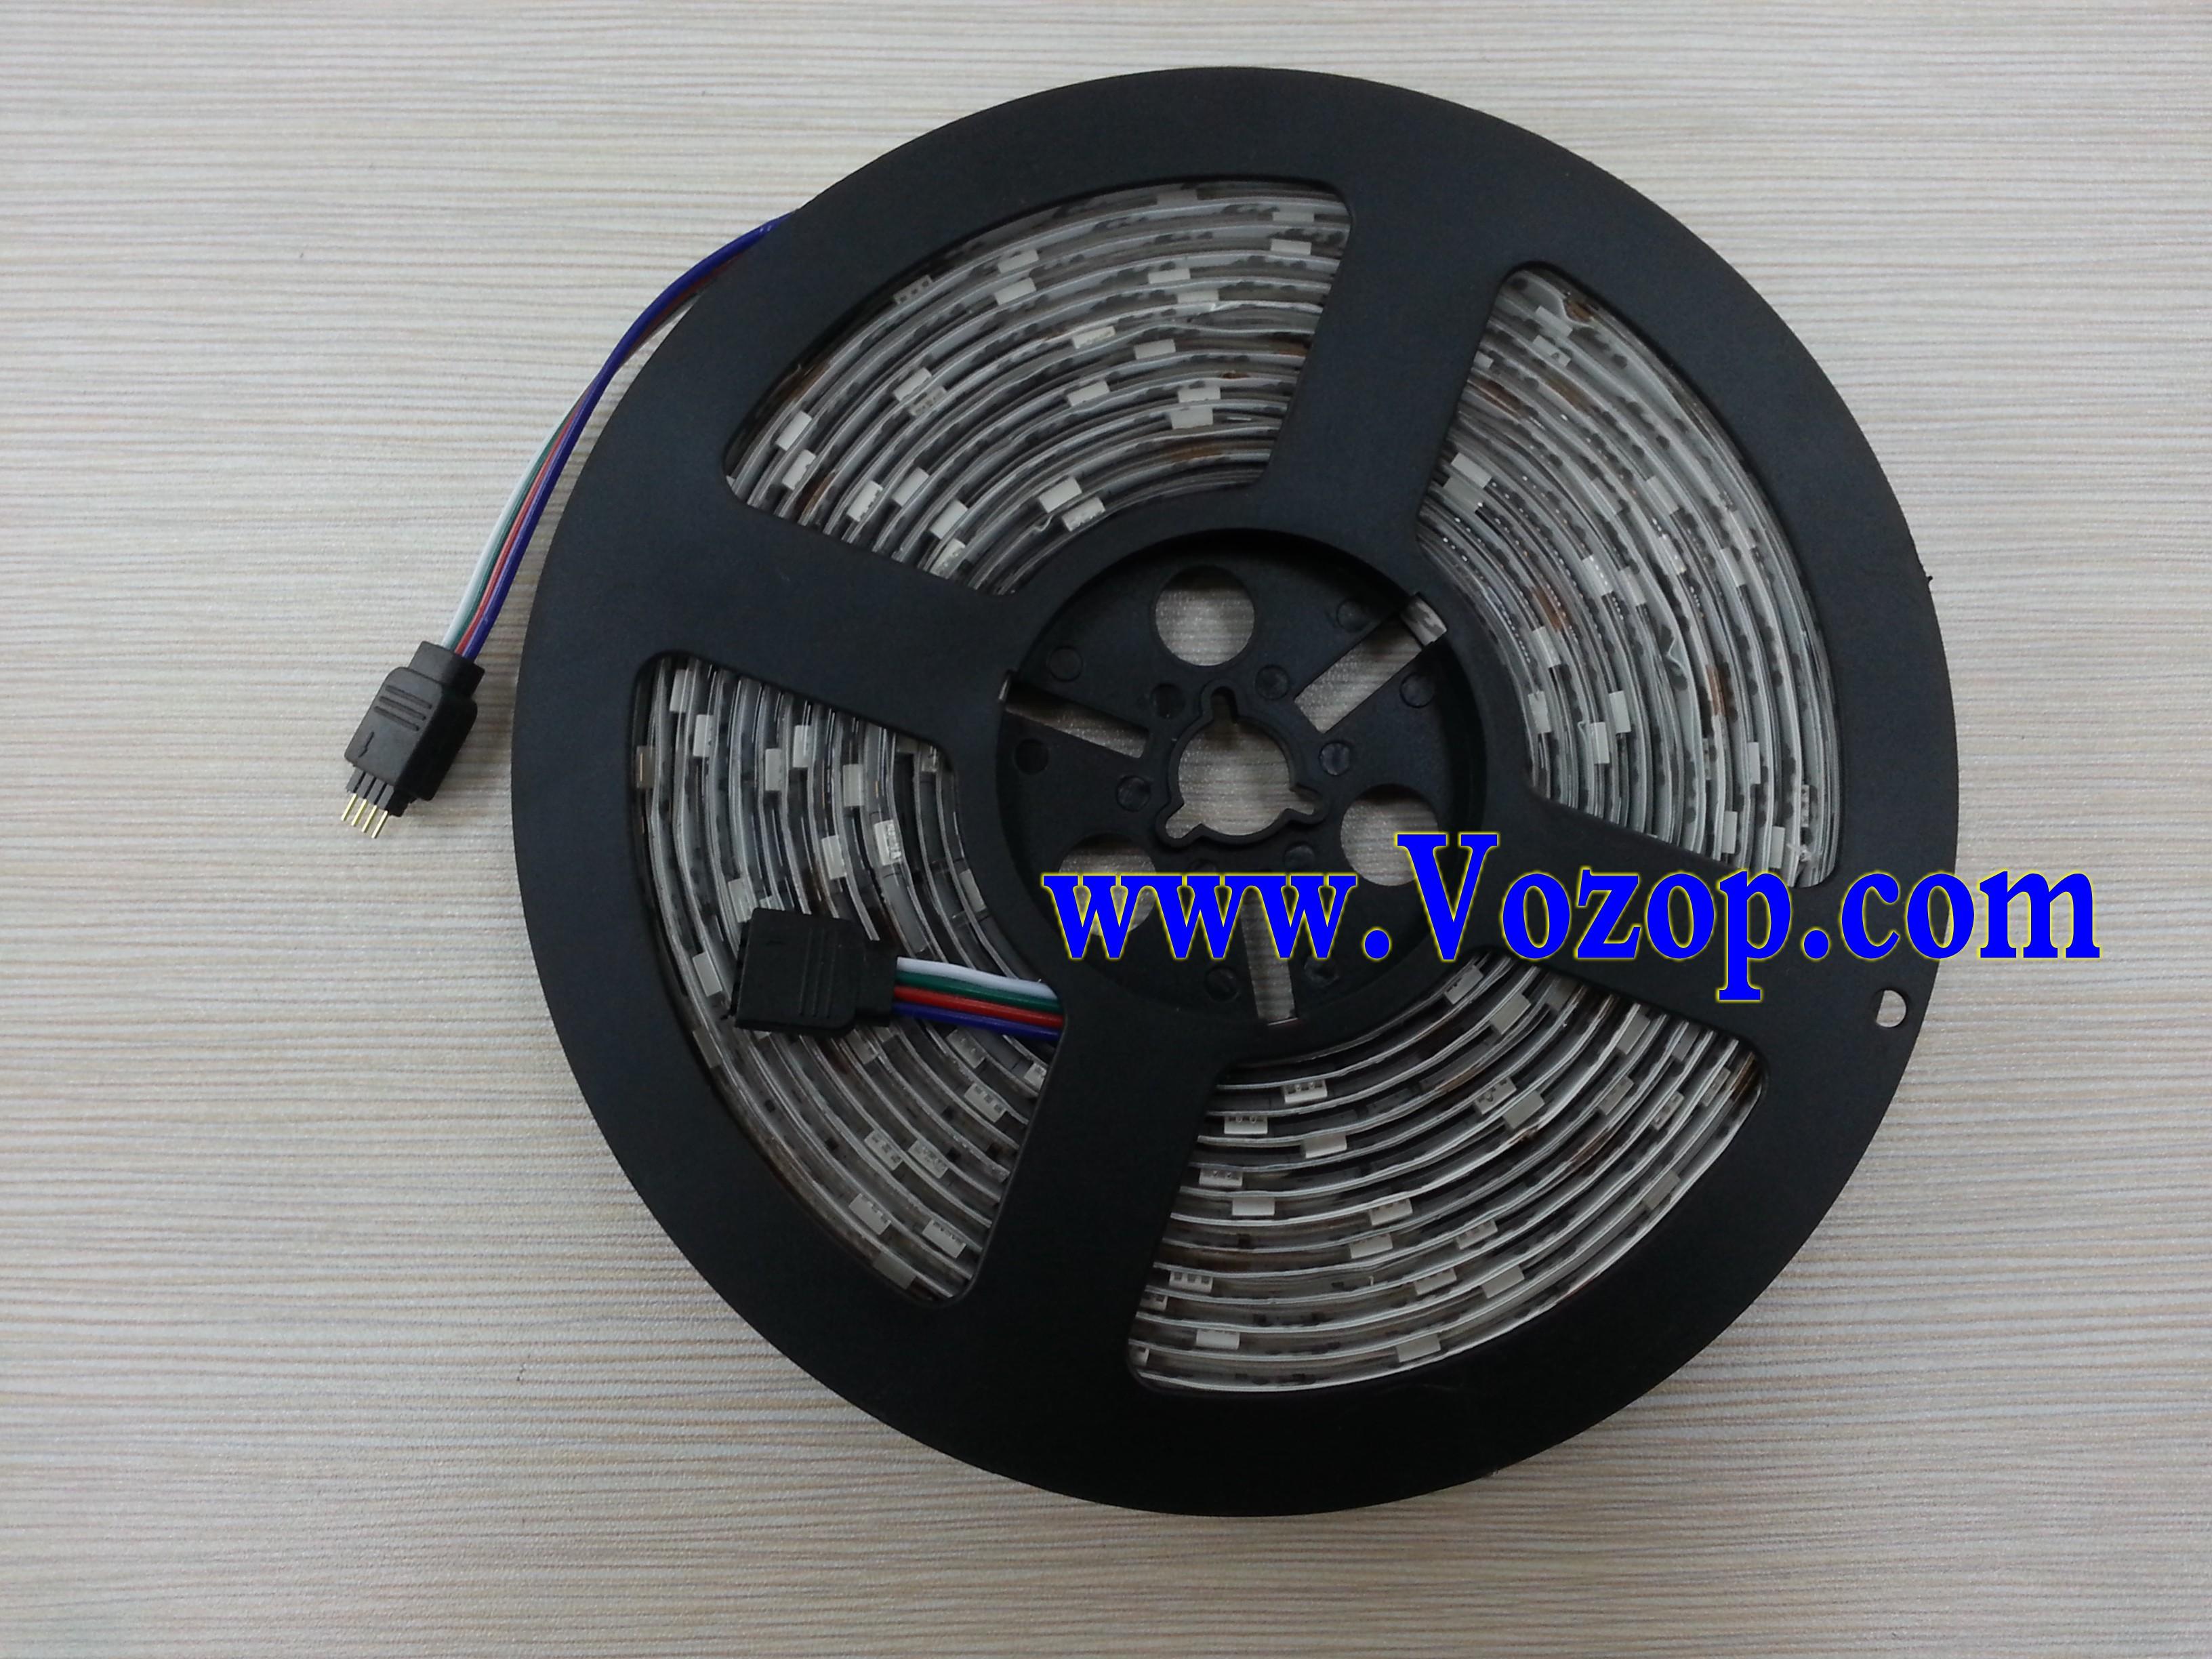 150LEDs_RGB_5050_LED_Strip_lights_5meters_per_roll